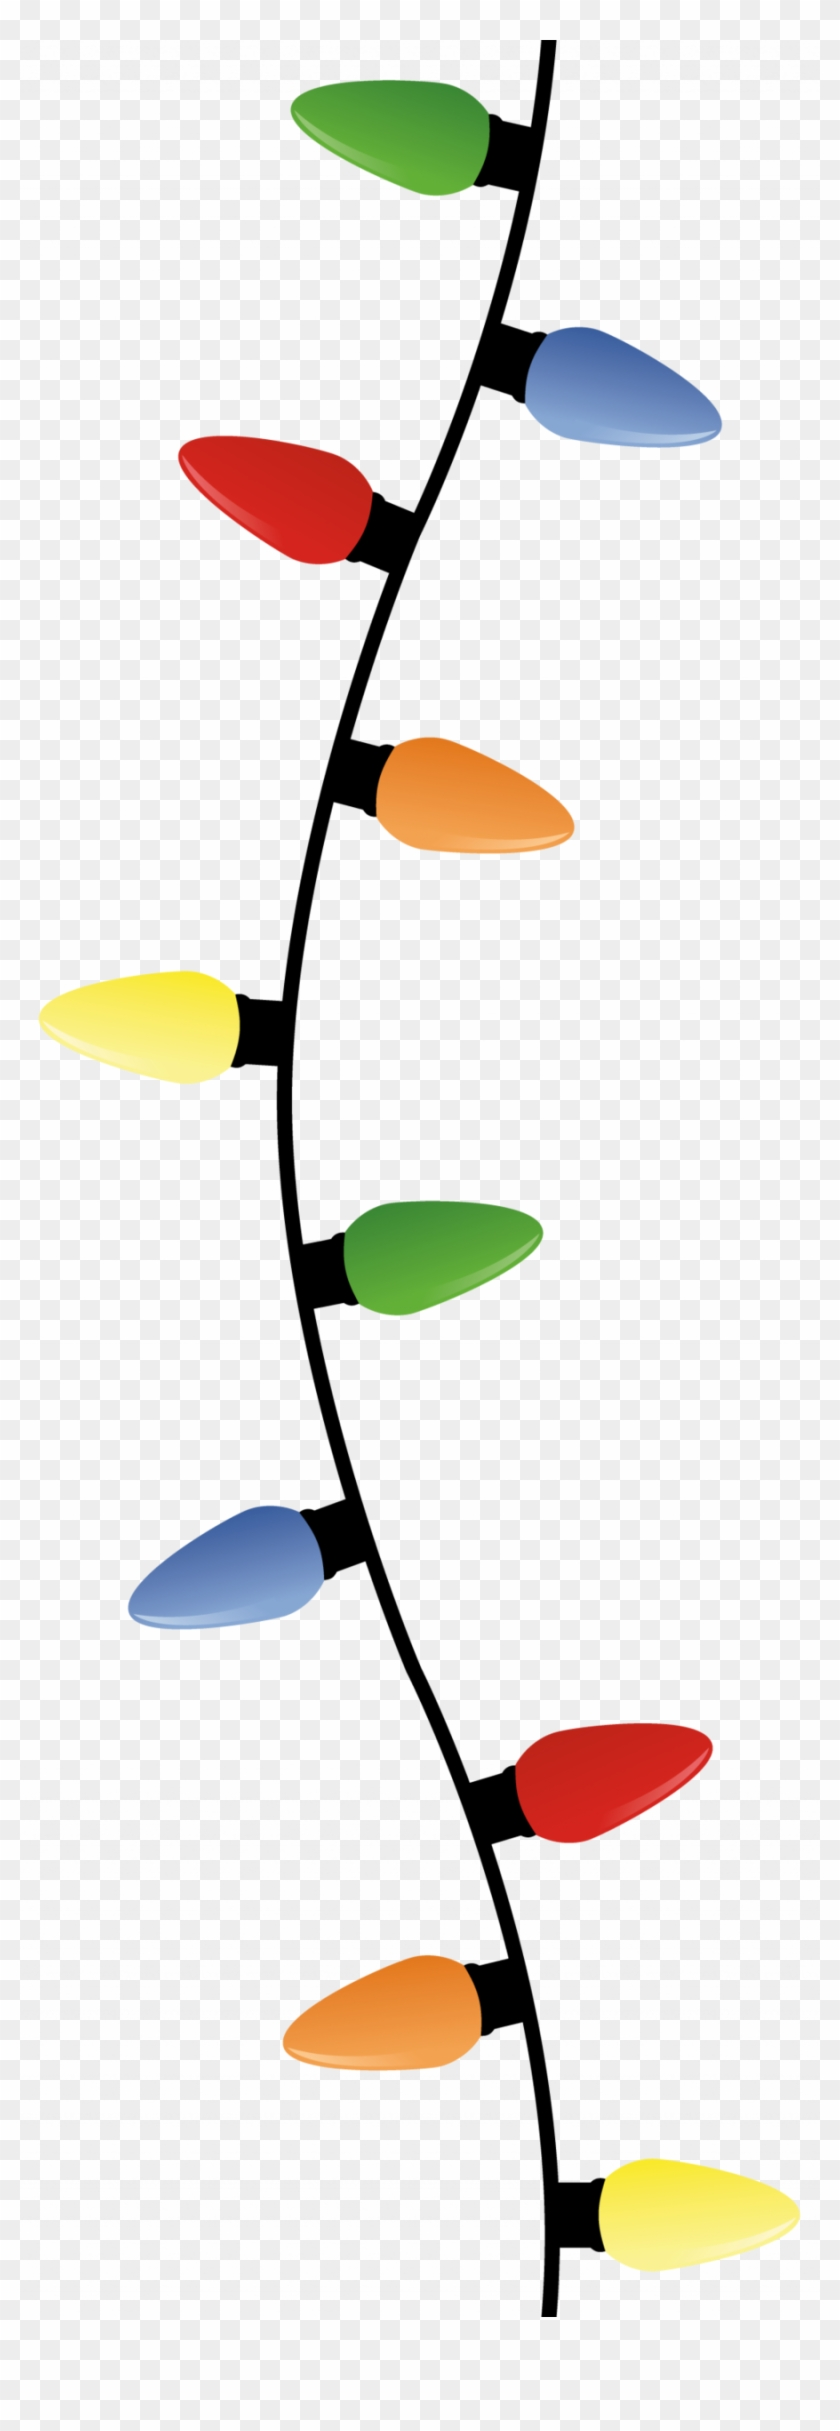 Christmas Light Bulbs Hanging Clipart Incandescent - Hanging Christmas Lights Transparent #1347807